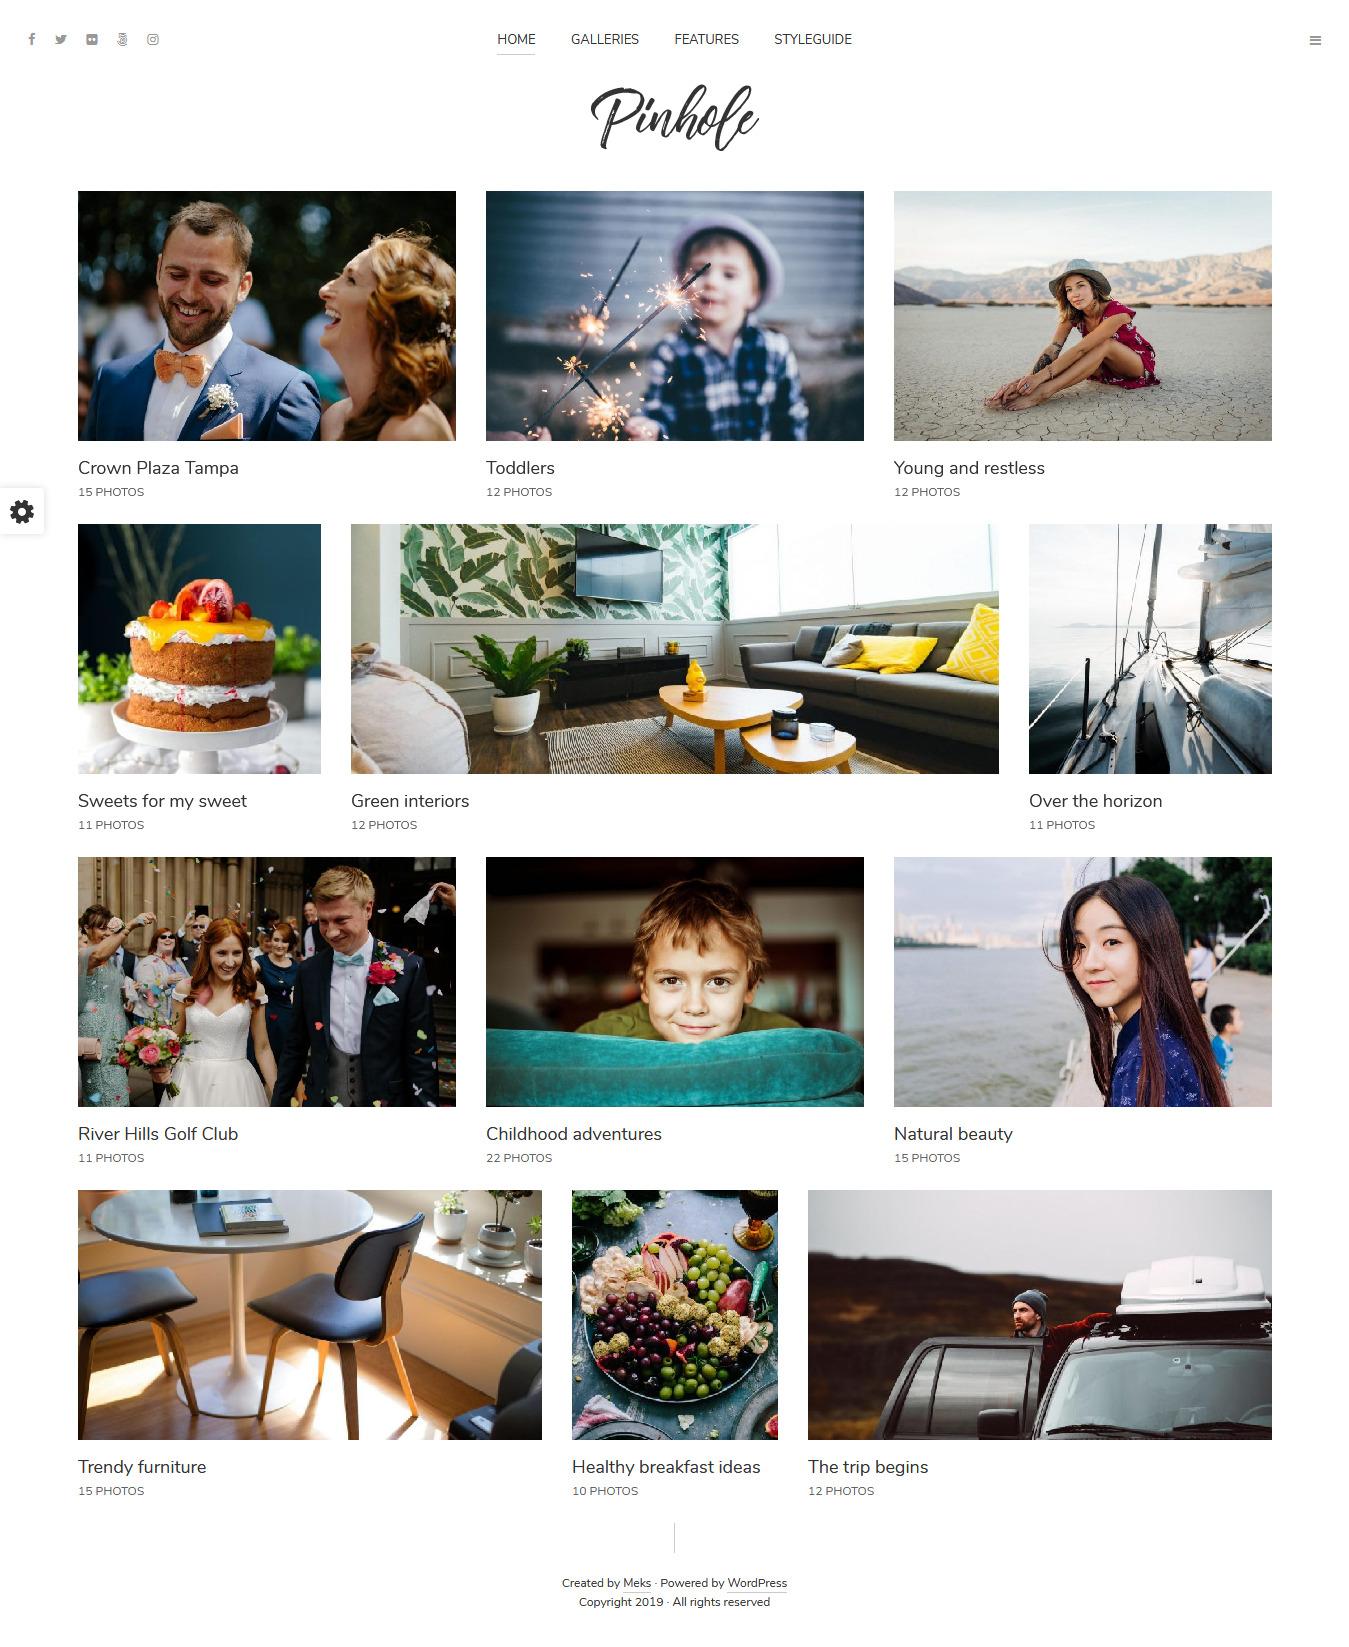 pinhole best premium gallery wordpress theme - 10+ Best Premium Gallery WordPress Themes